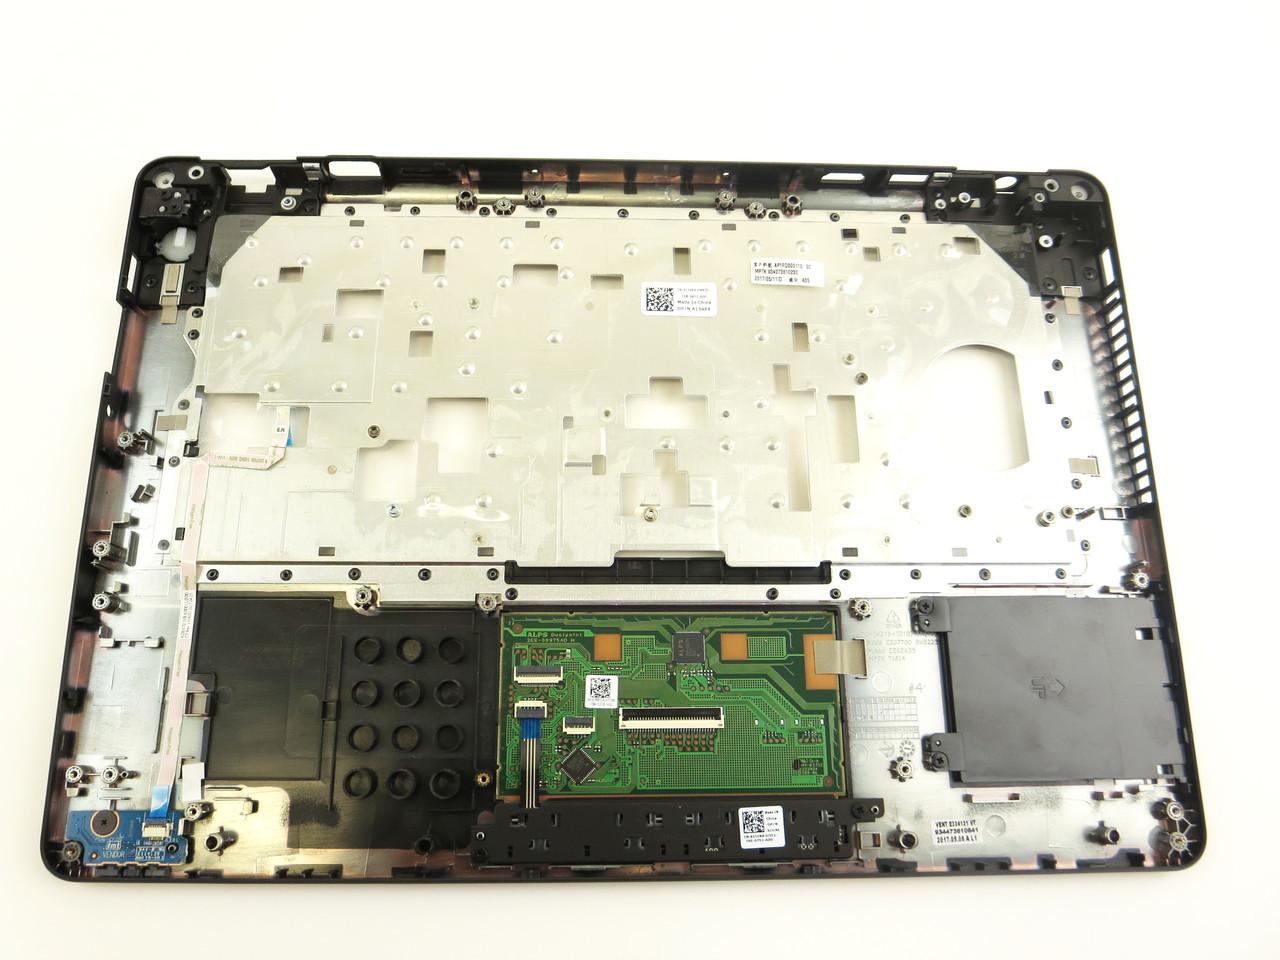 Dell Latitude E5470 Single Point Palmrest Touchpad Assembly - A154P4